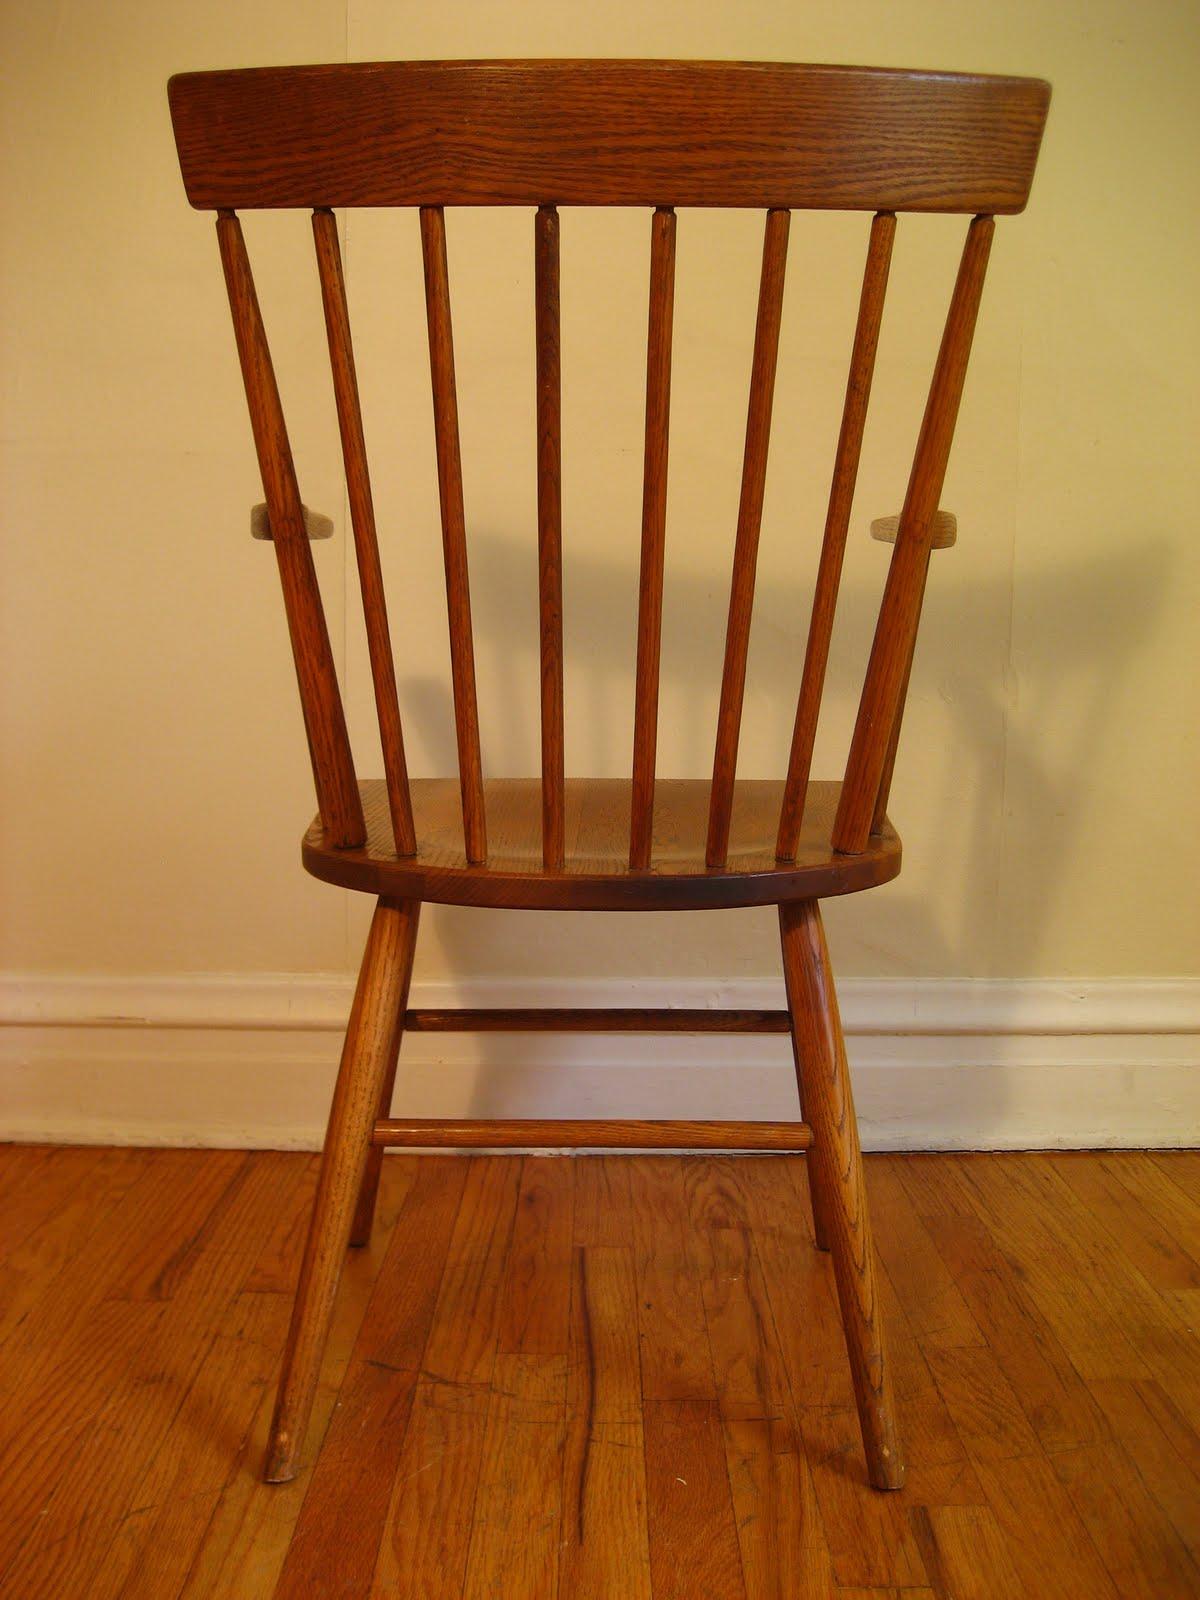 conant ball chair ergonomic office chairs johannesburg flatout design